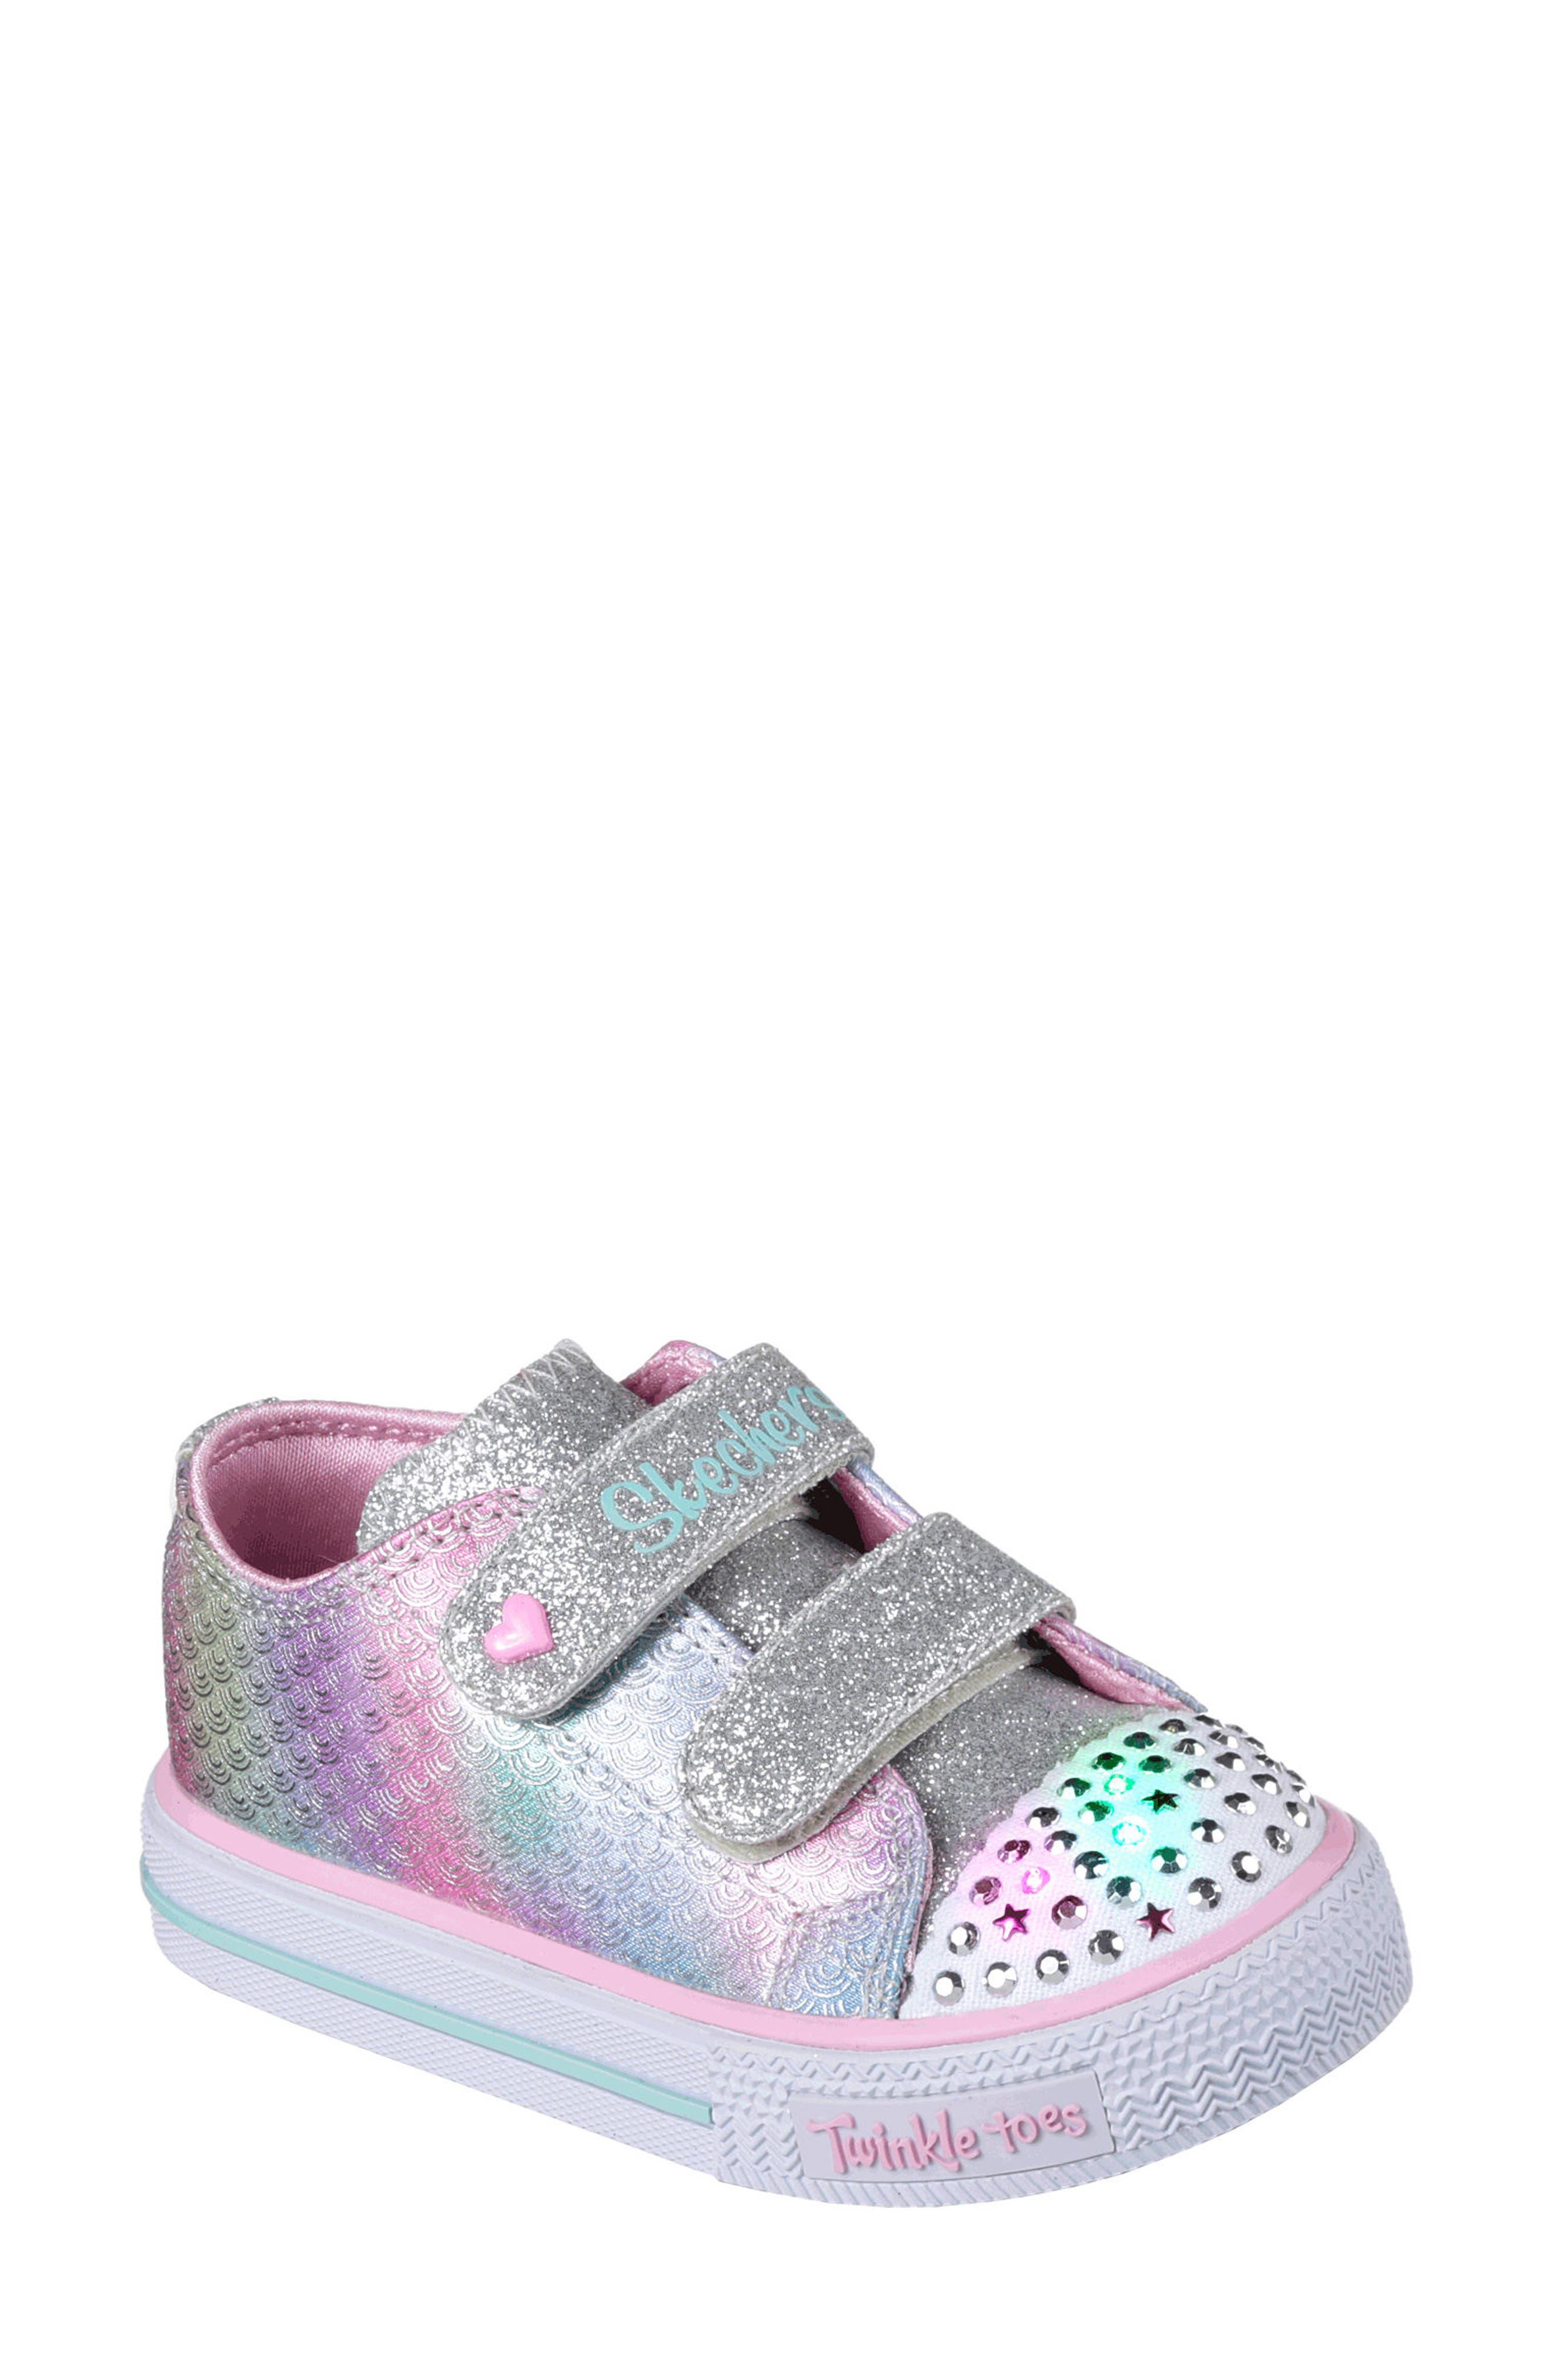 Shuffles - Itsy Bitsy Light-Up Sneaker,                         Main,                         color, Silver/ Multi